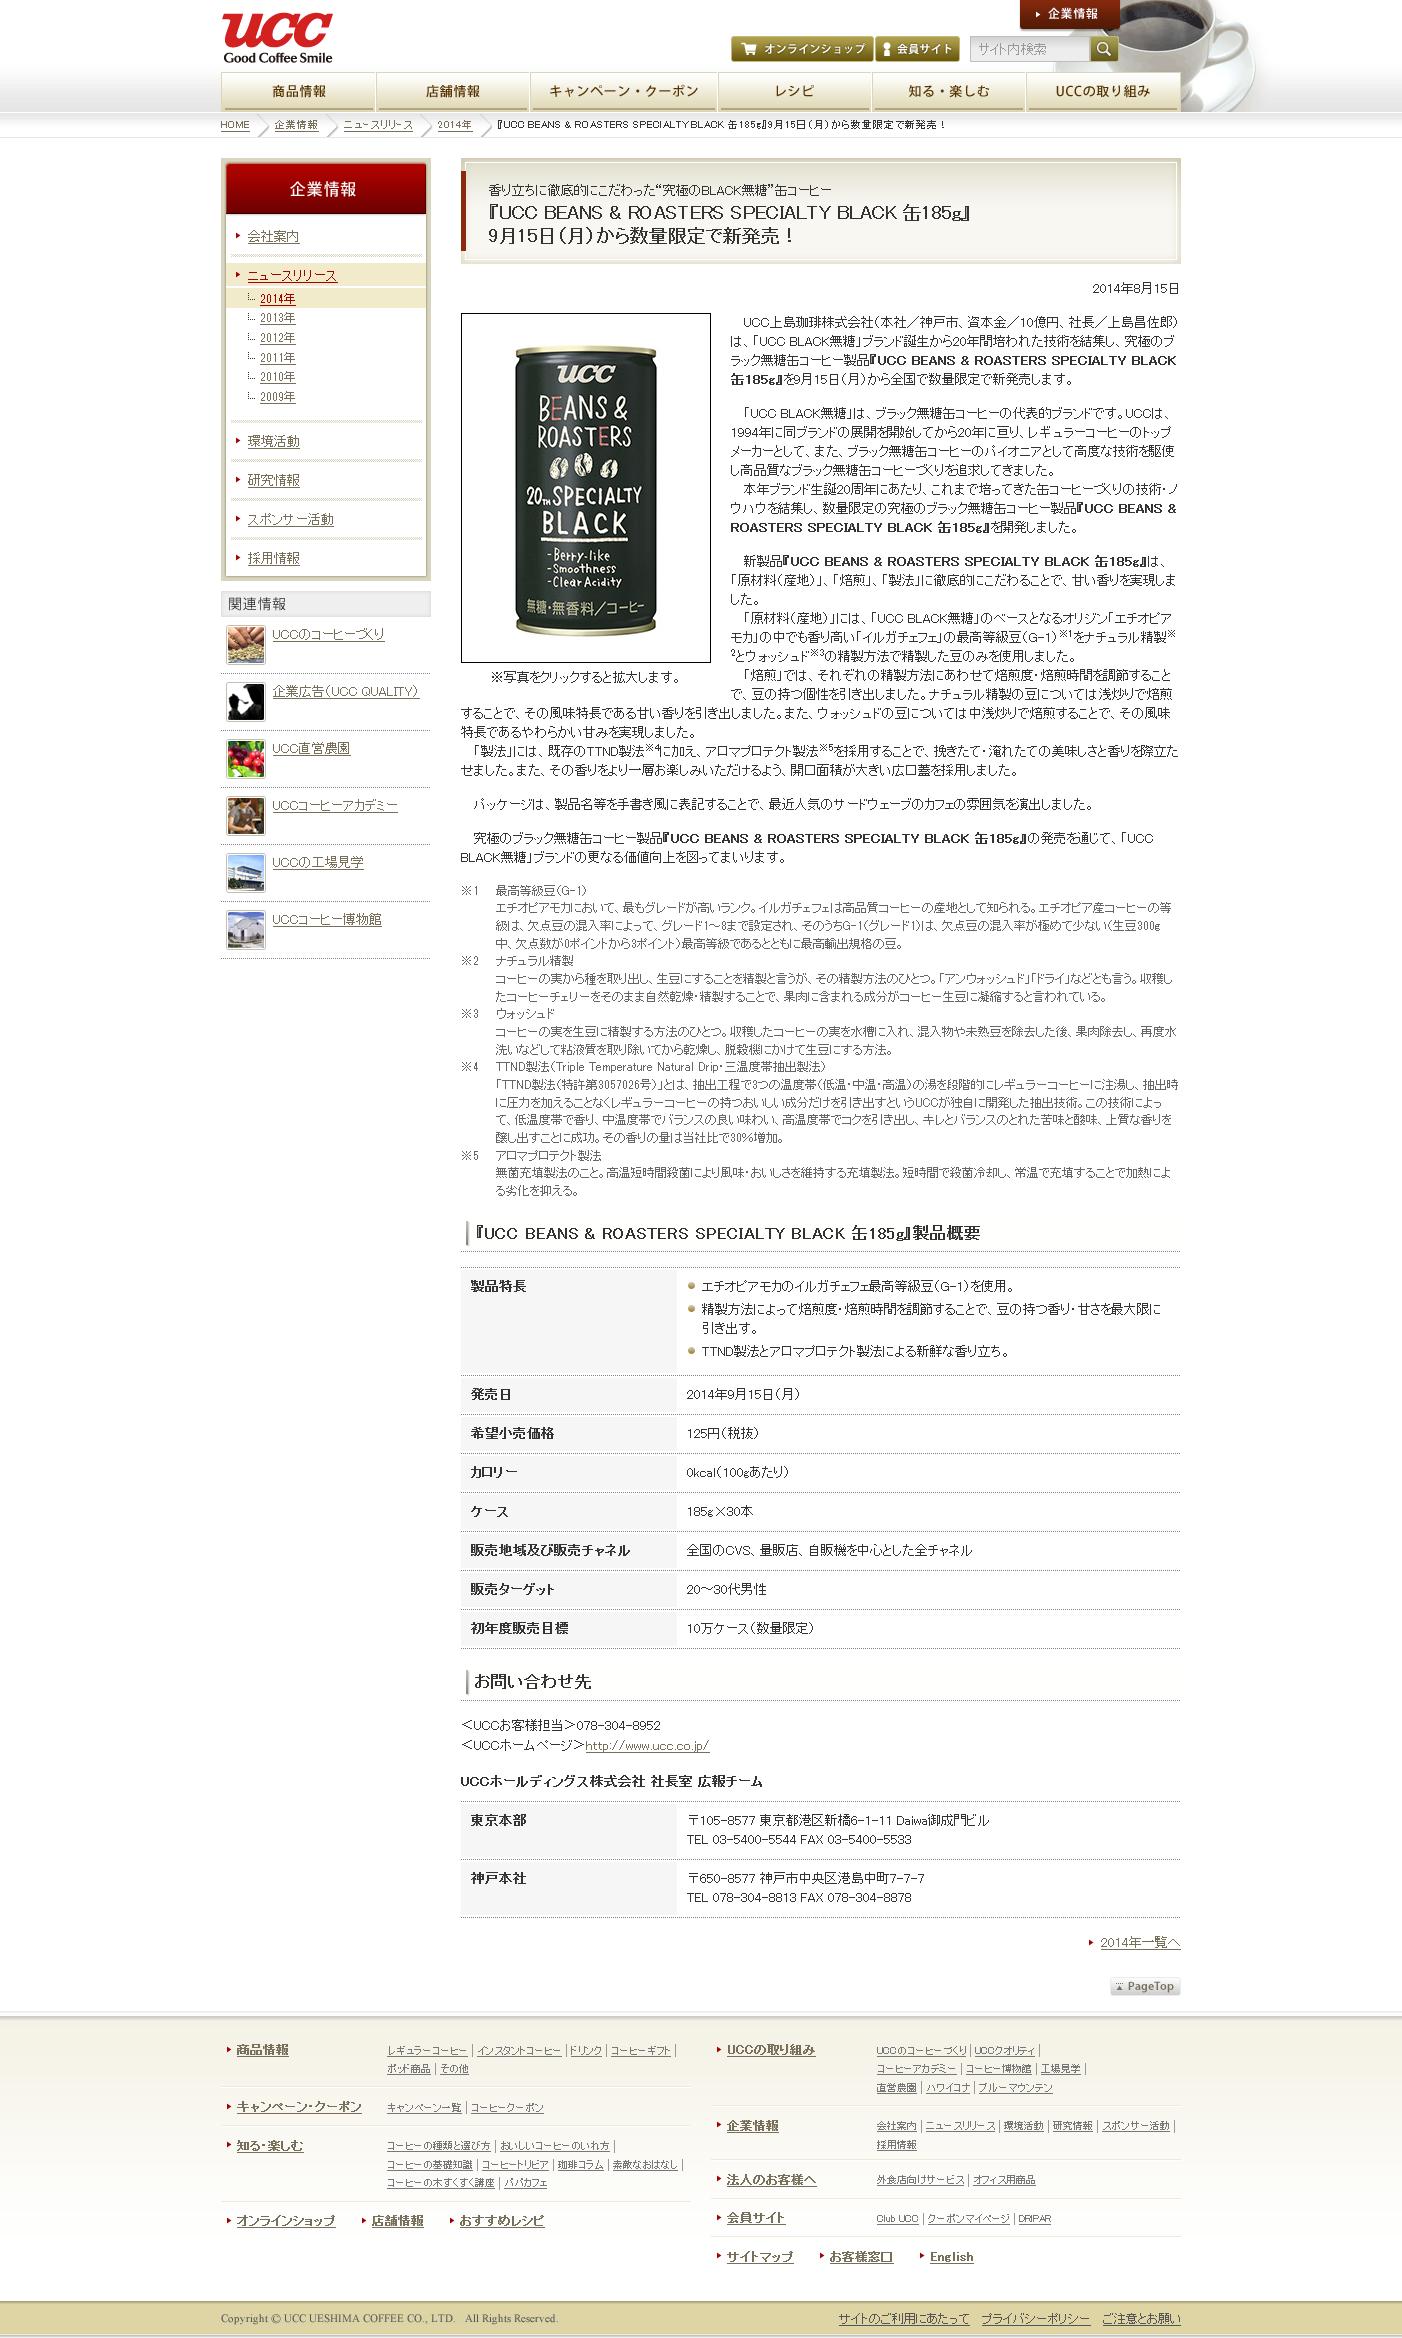 『UCC BEANS & ROASTERS SPECIALTY BLACK 缶185g』9月15日(月)から数量限定で新発売!  ニュースリリース  コーヒーはUCC上島珈琲